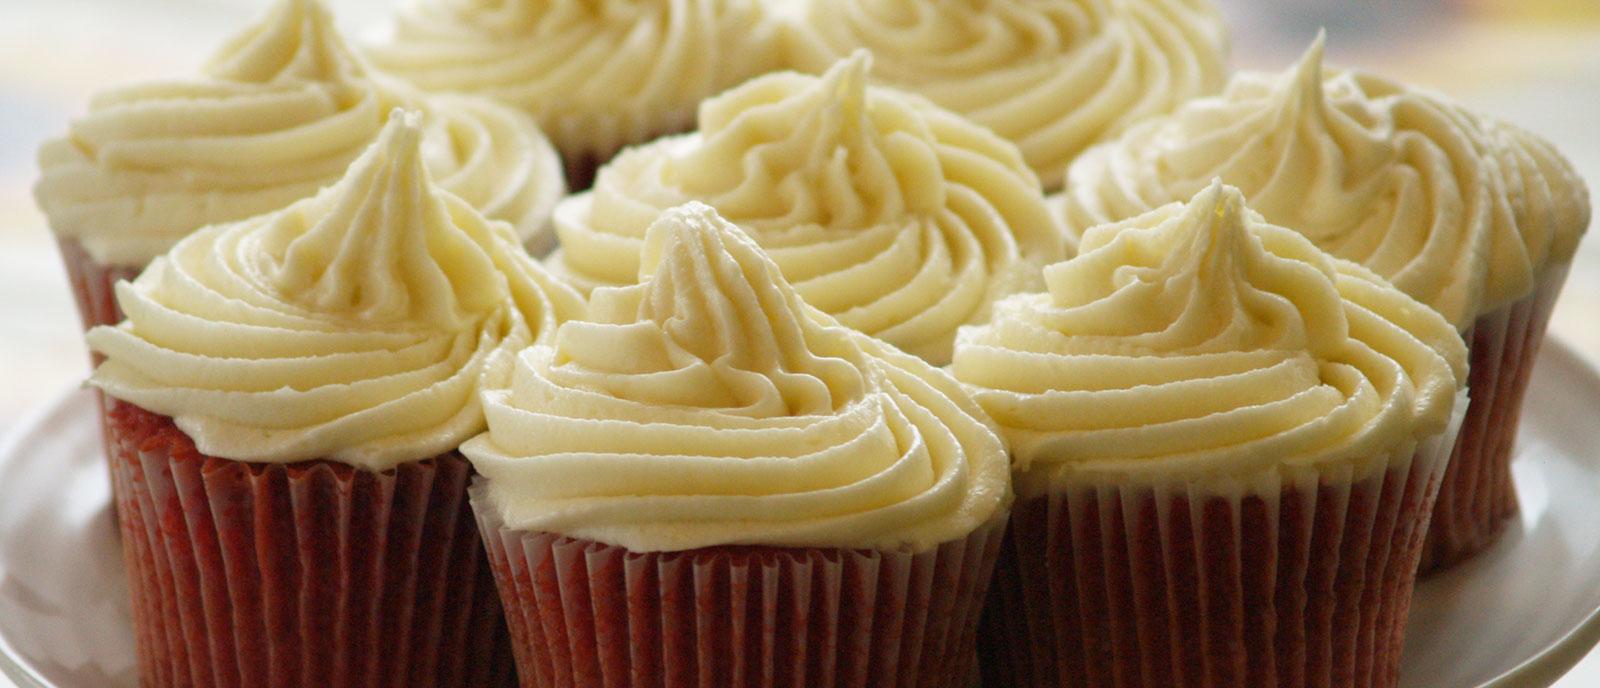 cupcakes-slider